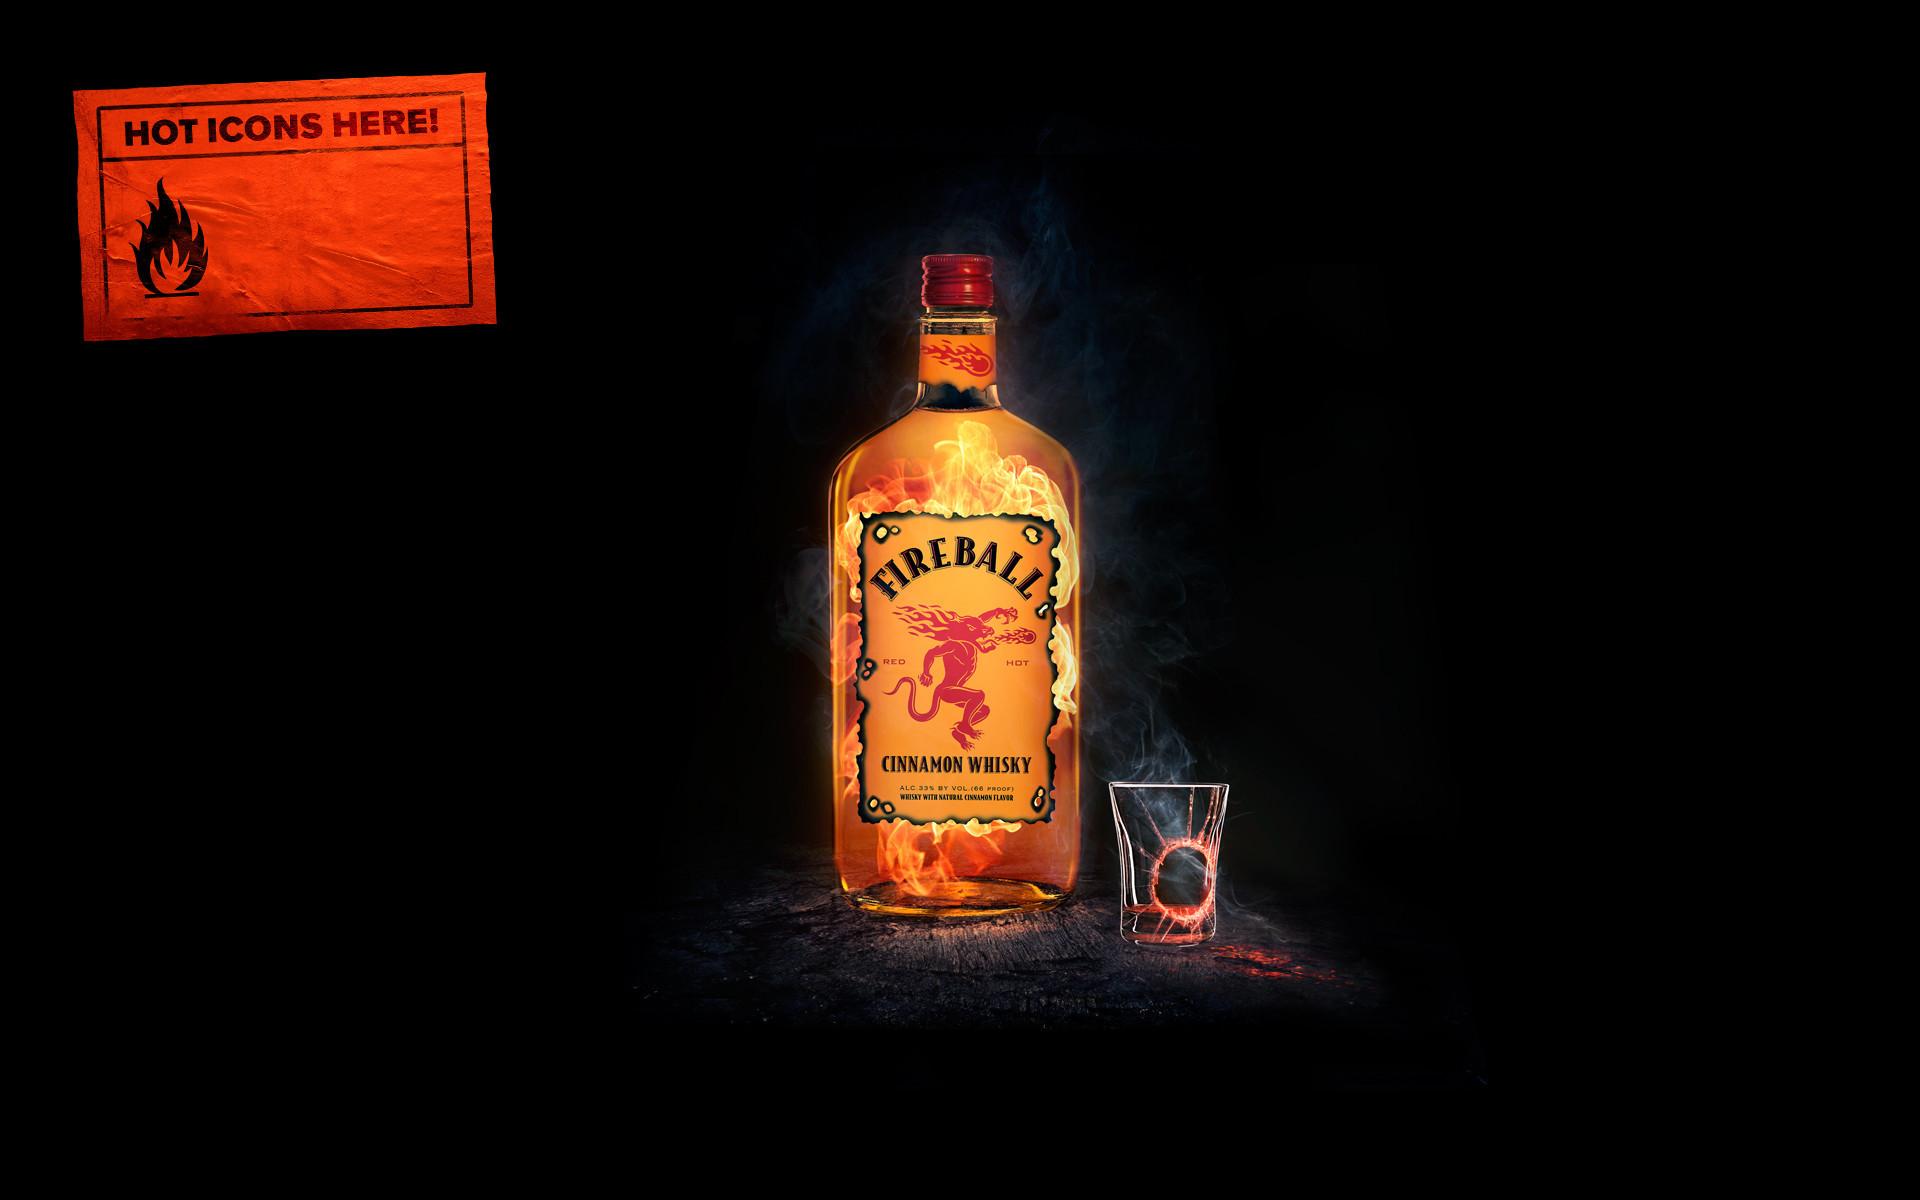 Fireball Whisky Alcohol Wallpaper 66392 1920x1200px 1920x1200